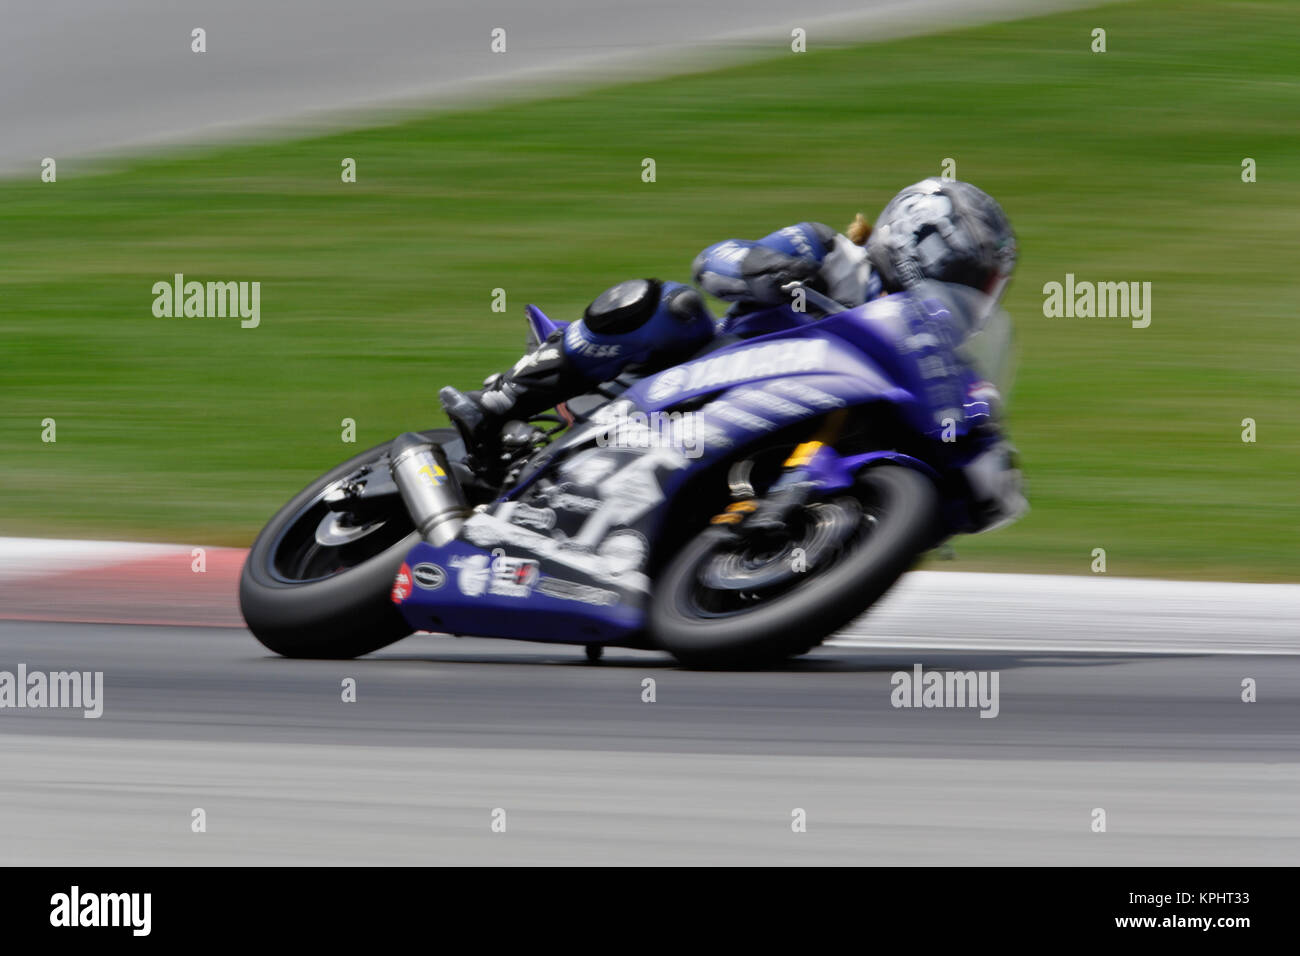 Mid Ohio Raceway >> Motorcycle In Motion Ama Superbike Race Mid Ohio Raceway